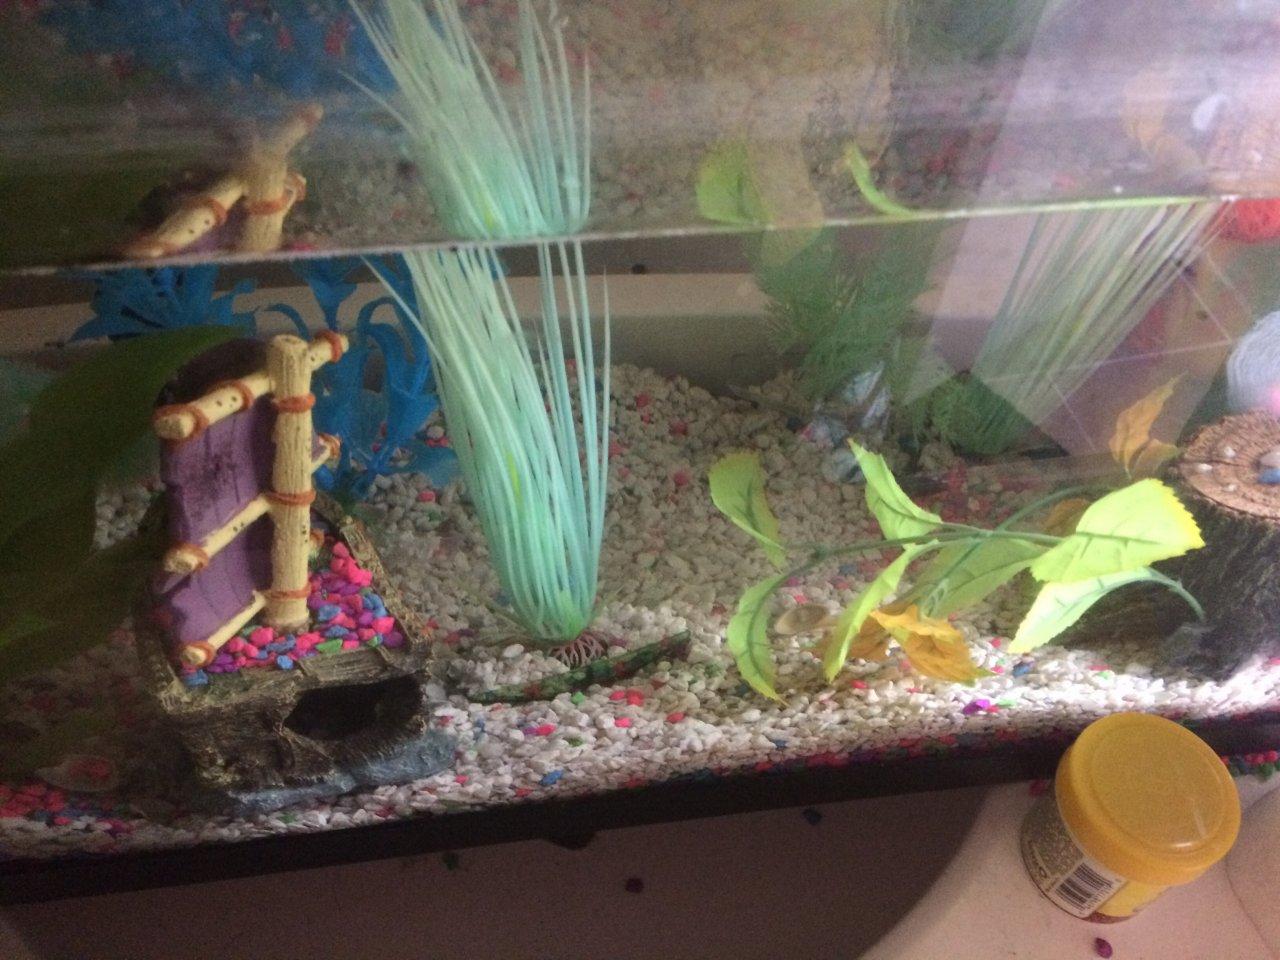 Betta fish stays at bottom